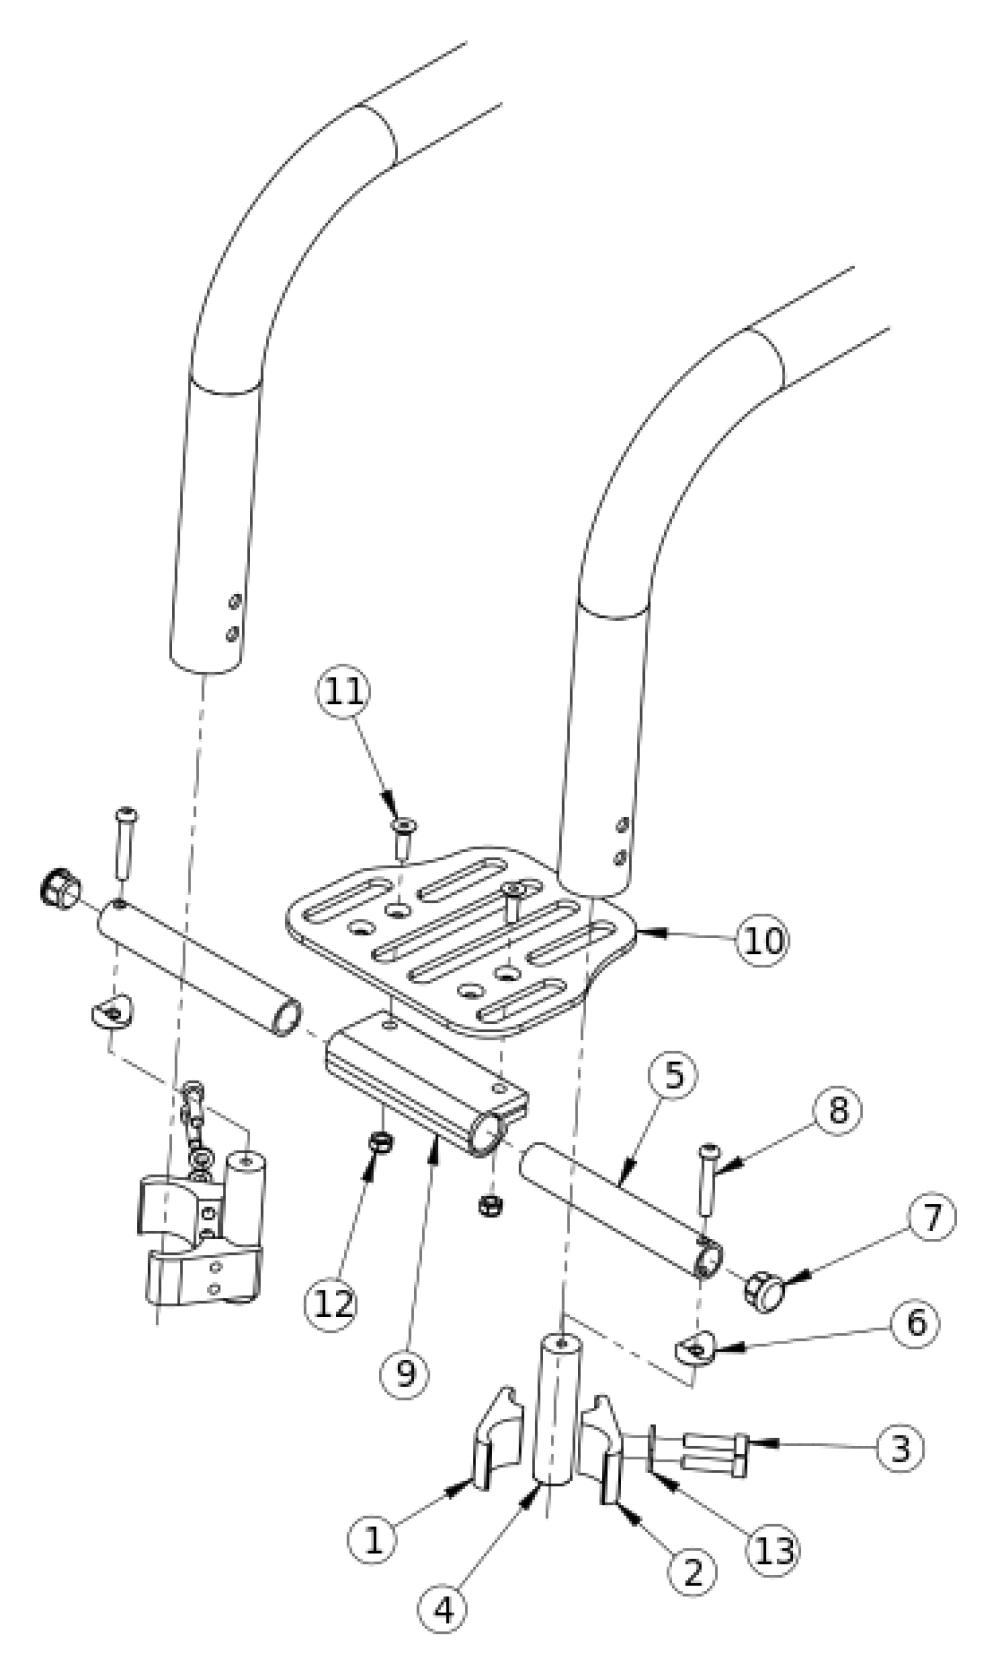 (discontinued) Rigid High Mount Angle Adjustable Footrest 10